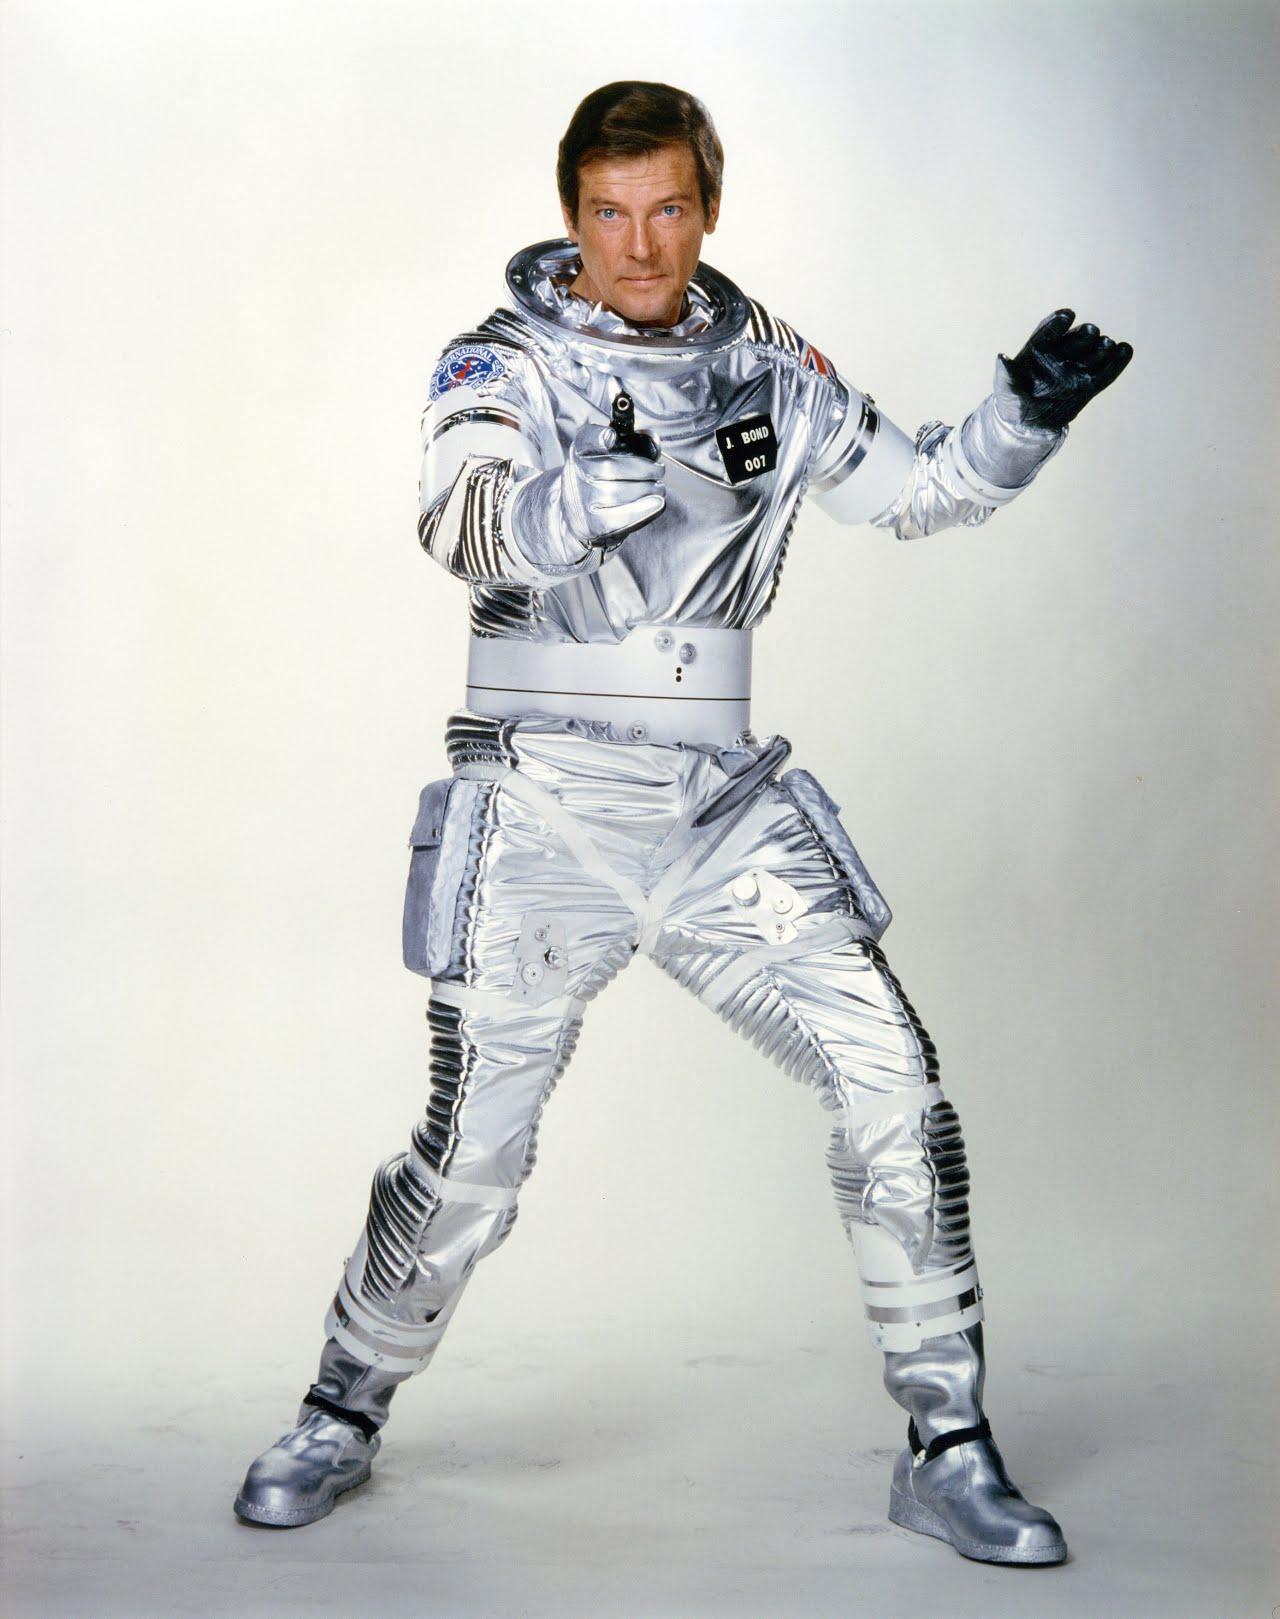 1979, Лунный гонщик (Moonraker)